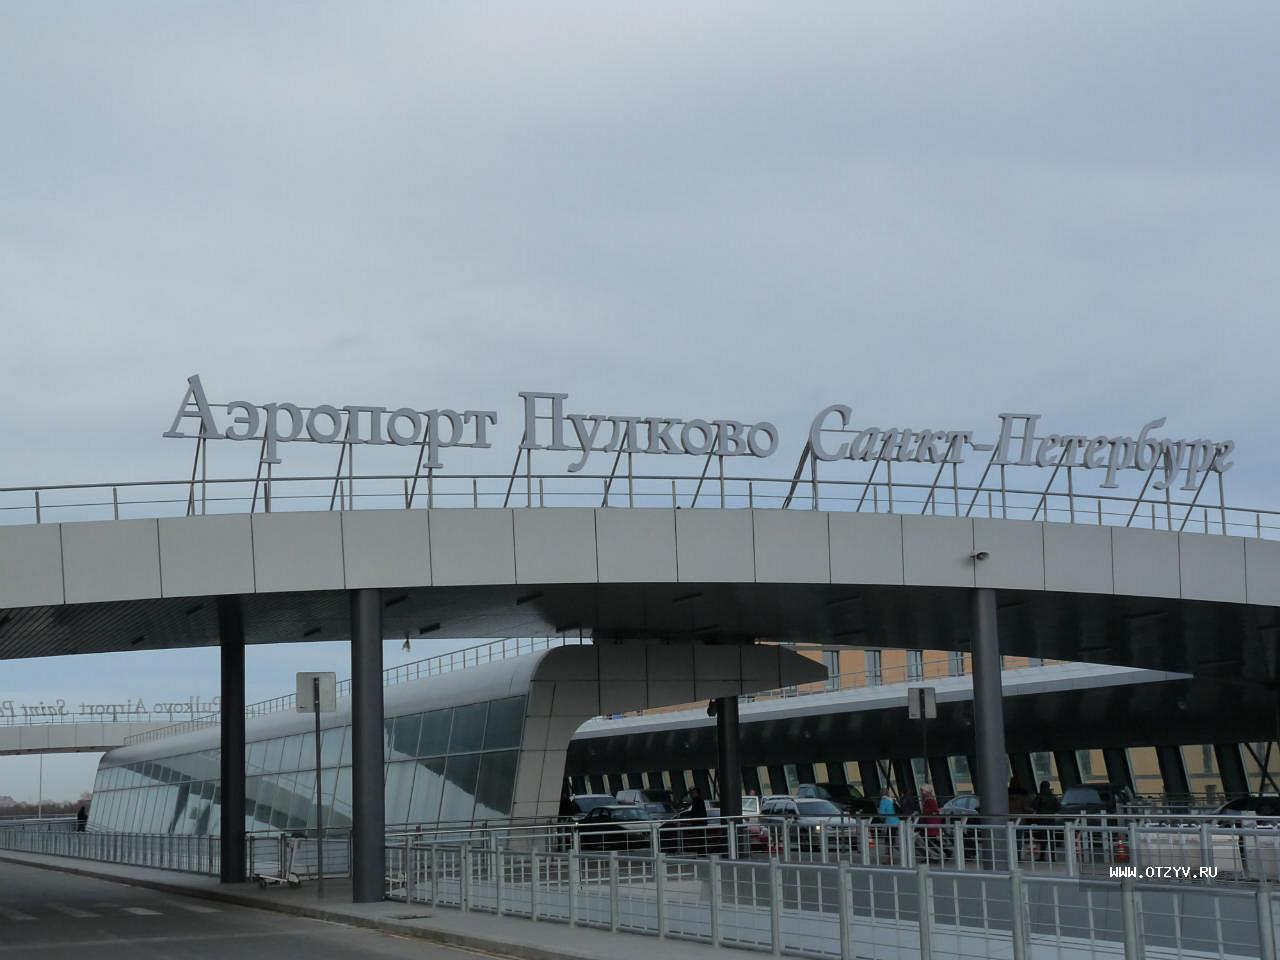 Новый аэропорт Пулково: http://www.otzyv.ru/read.php?id=172499